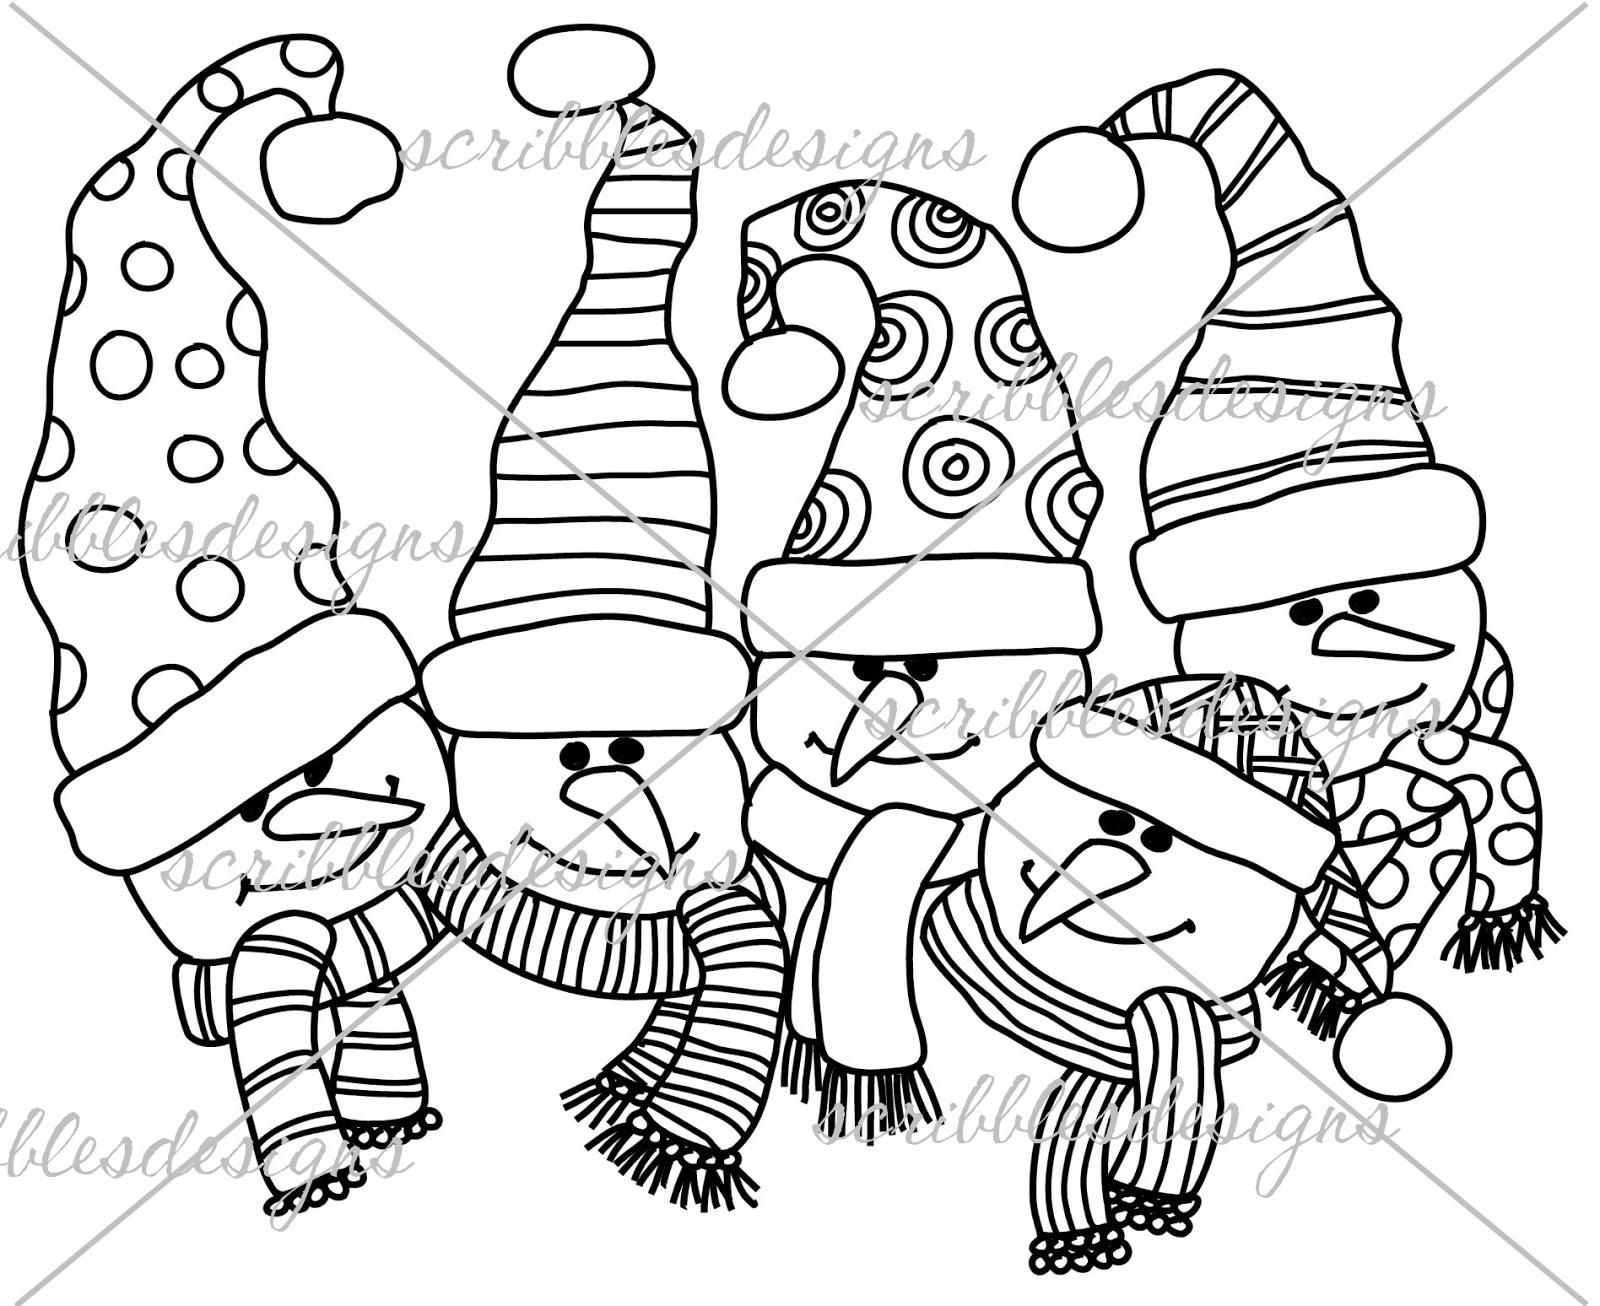 http://buyscribblesdesigns.blogspot.co.uk/2014/12/873-snowheads-1-300.html